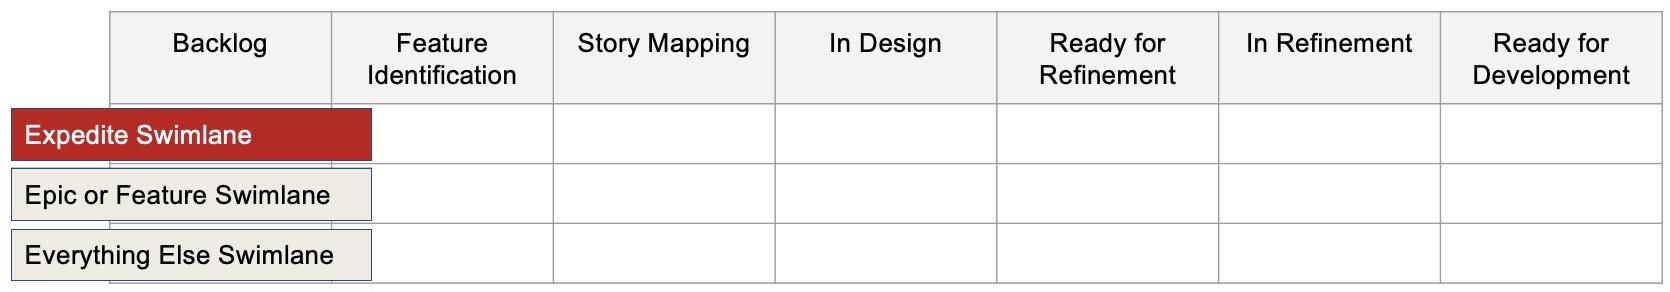 Agile Delivery Playbook - Planning Kanban